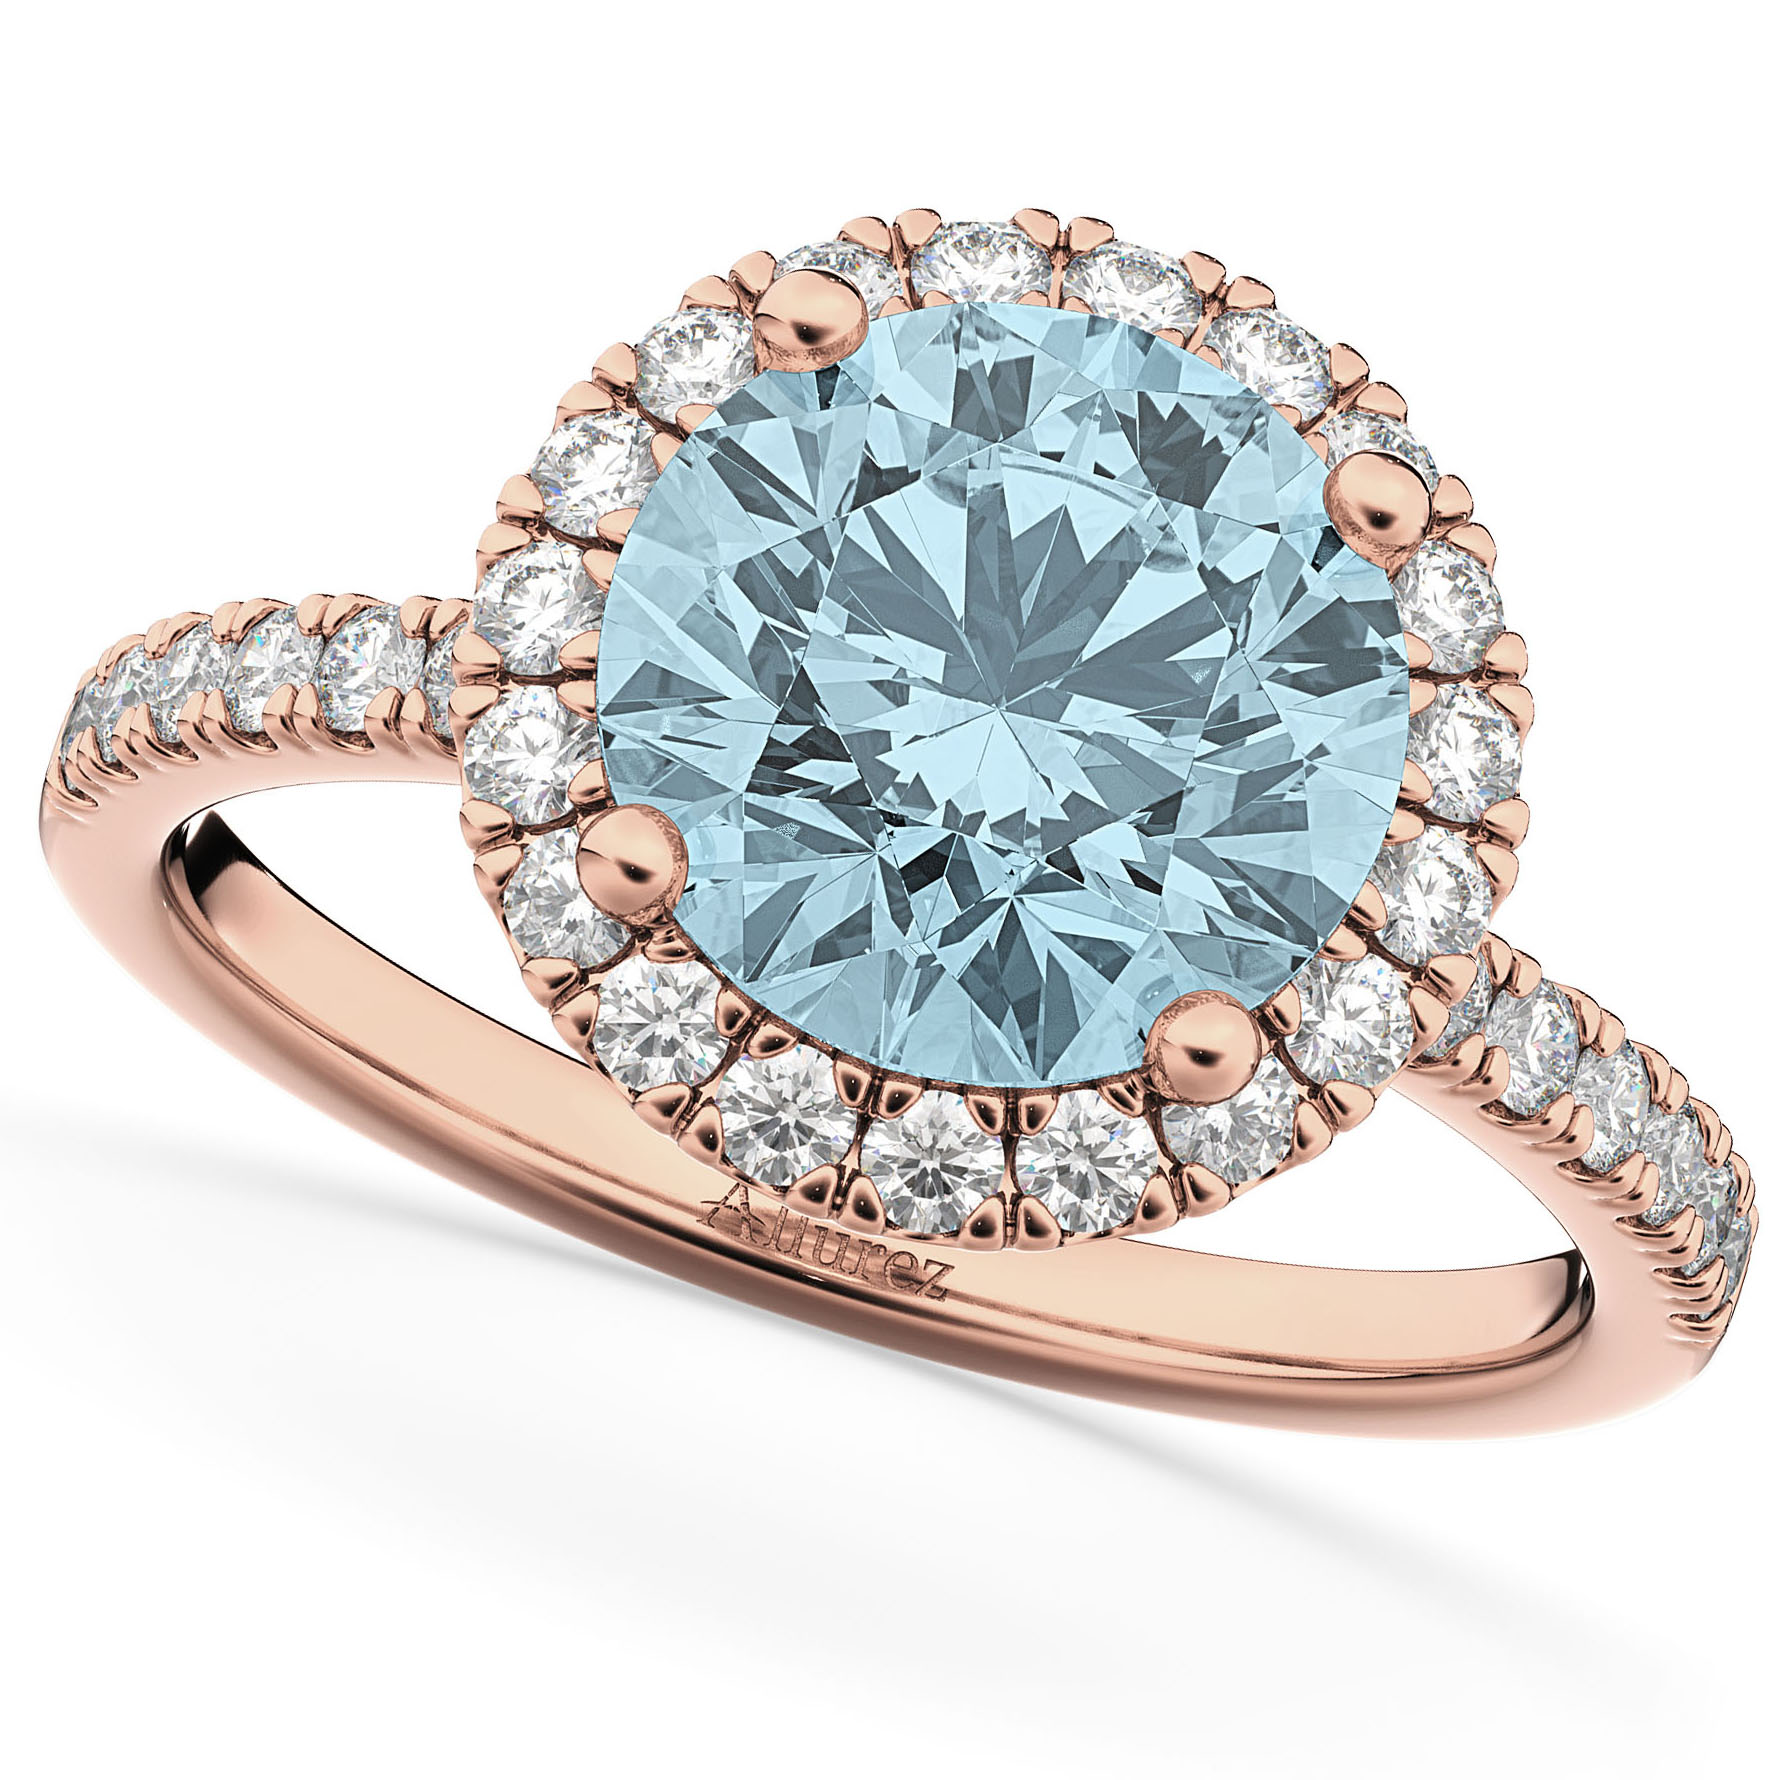 Halo Aquamarine & Diamond Engagement Ring 14K Rose Gold 2.70ct